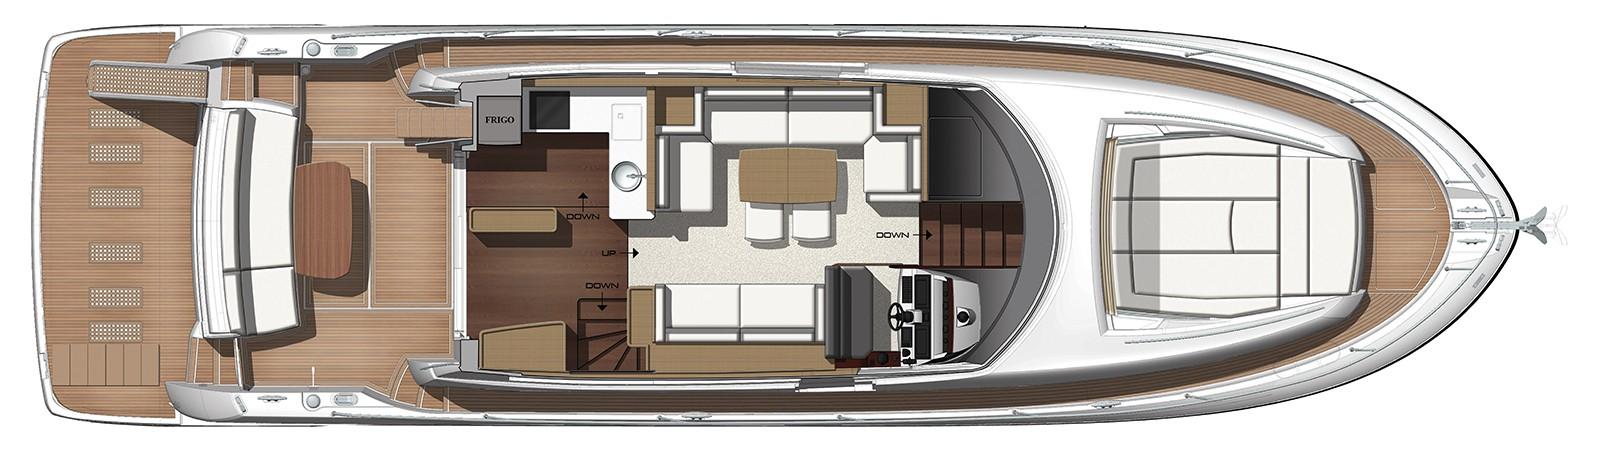 P560S-Plan-Main-deck-2017-